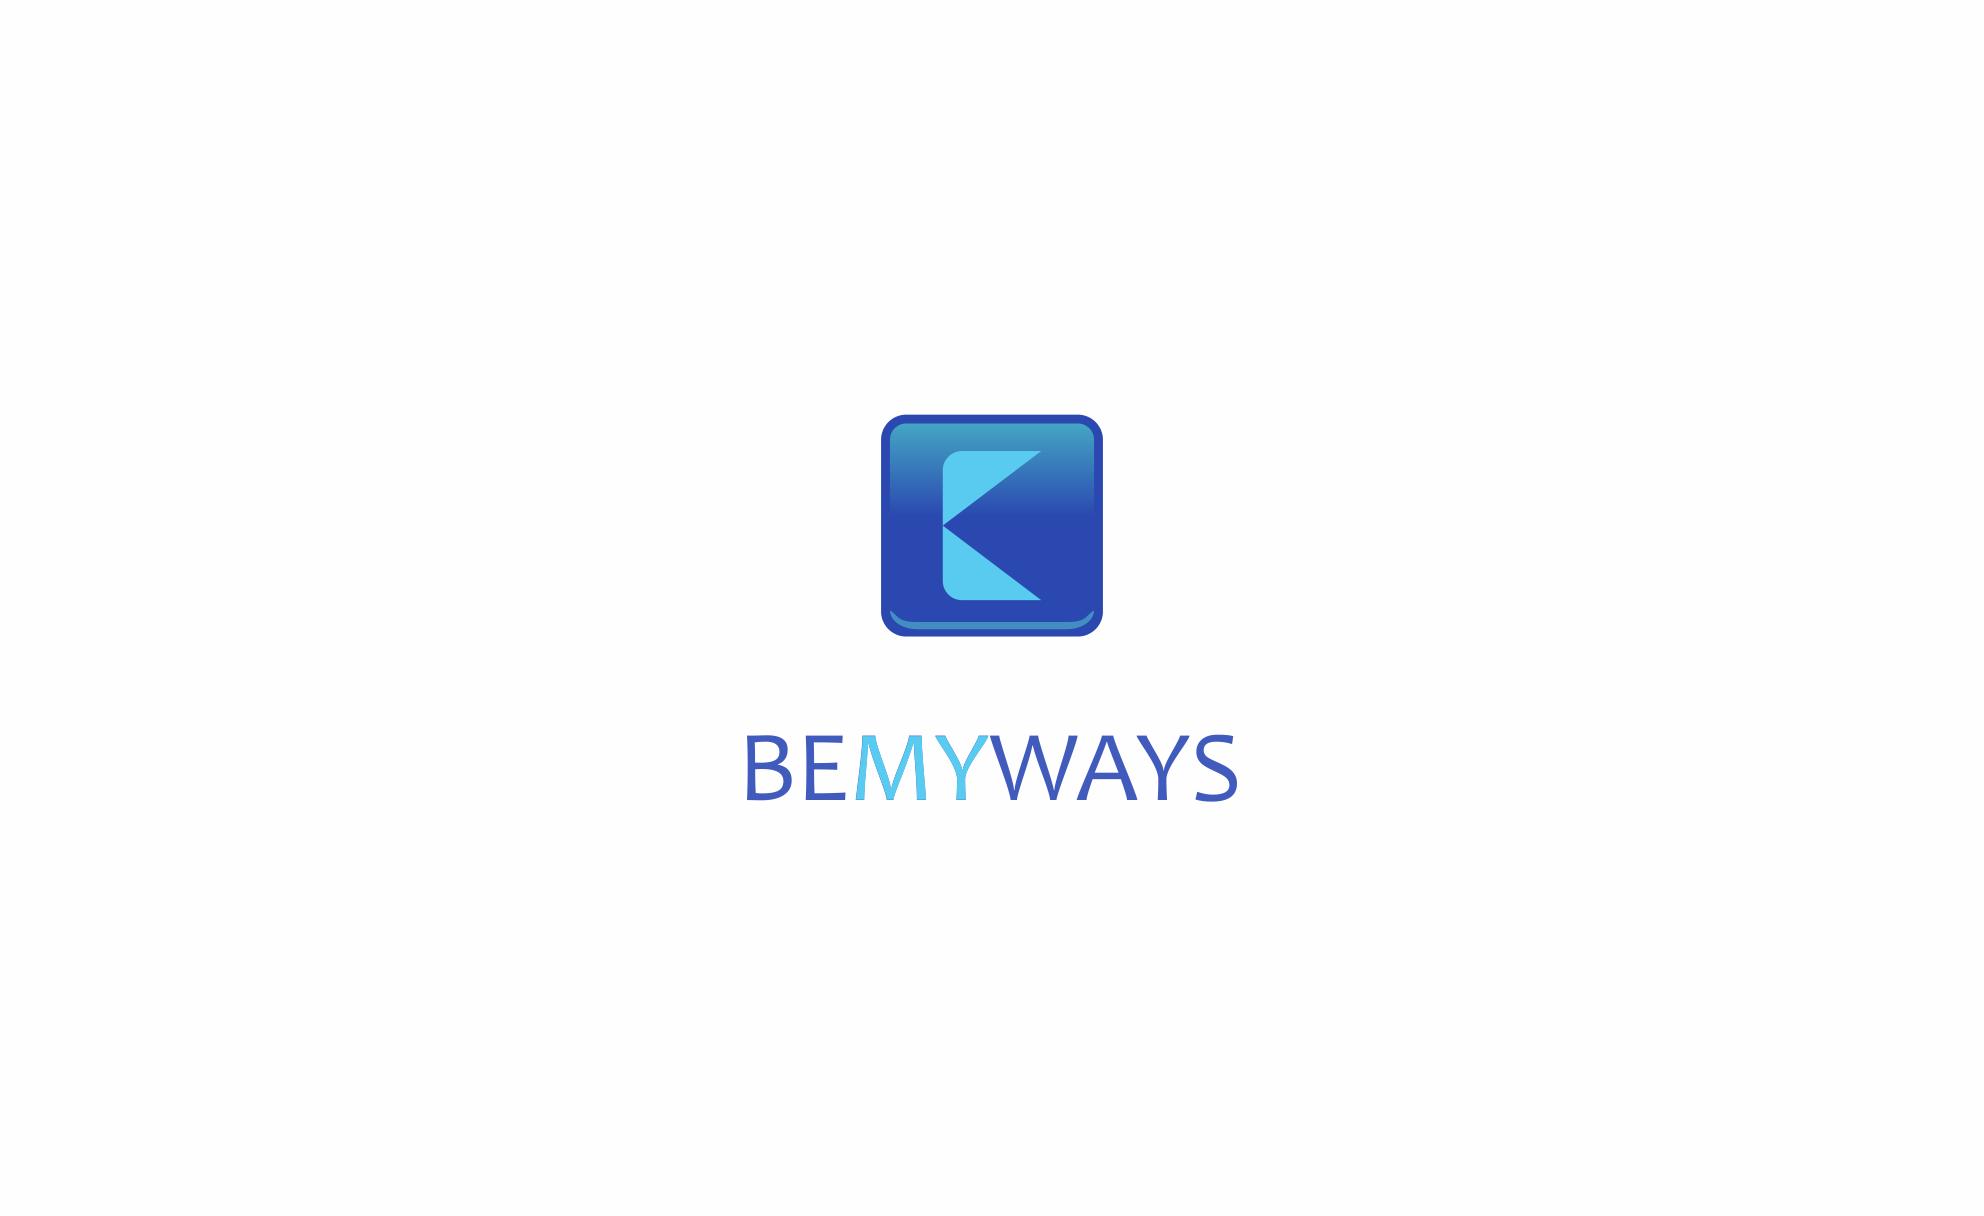 Разработка логотипа и иконки для Travel Video Platform фото f_2575c35978f1fb79.png